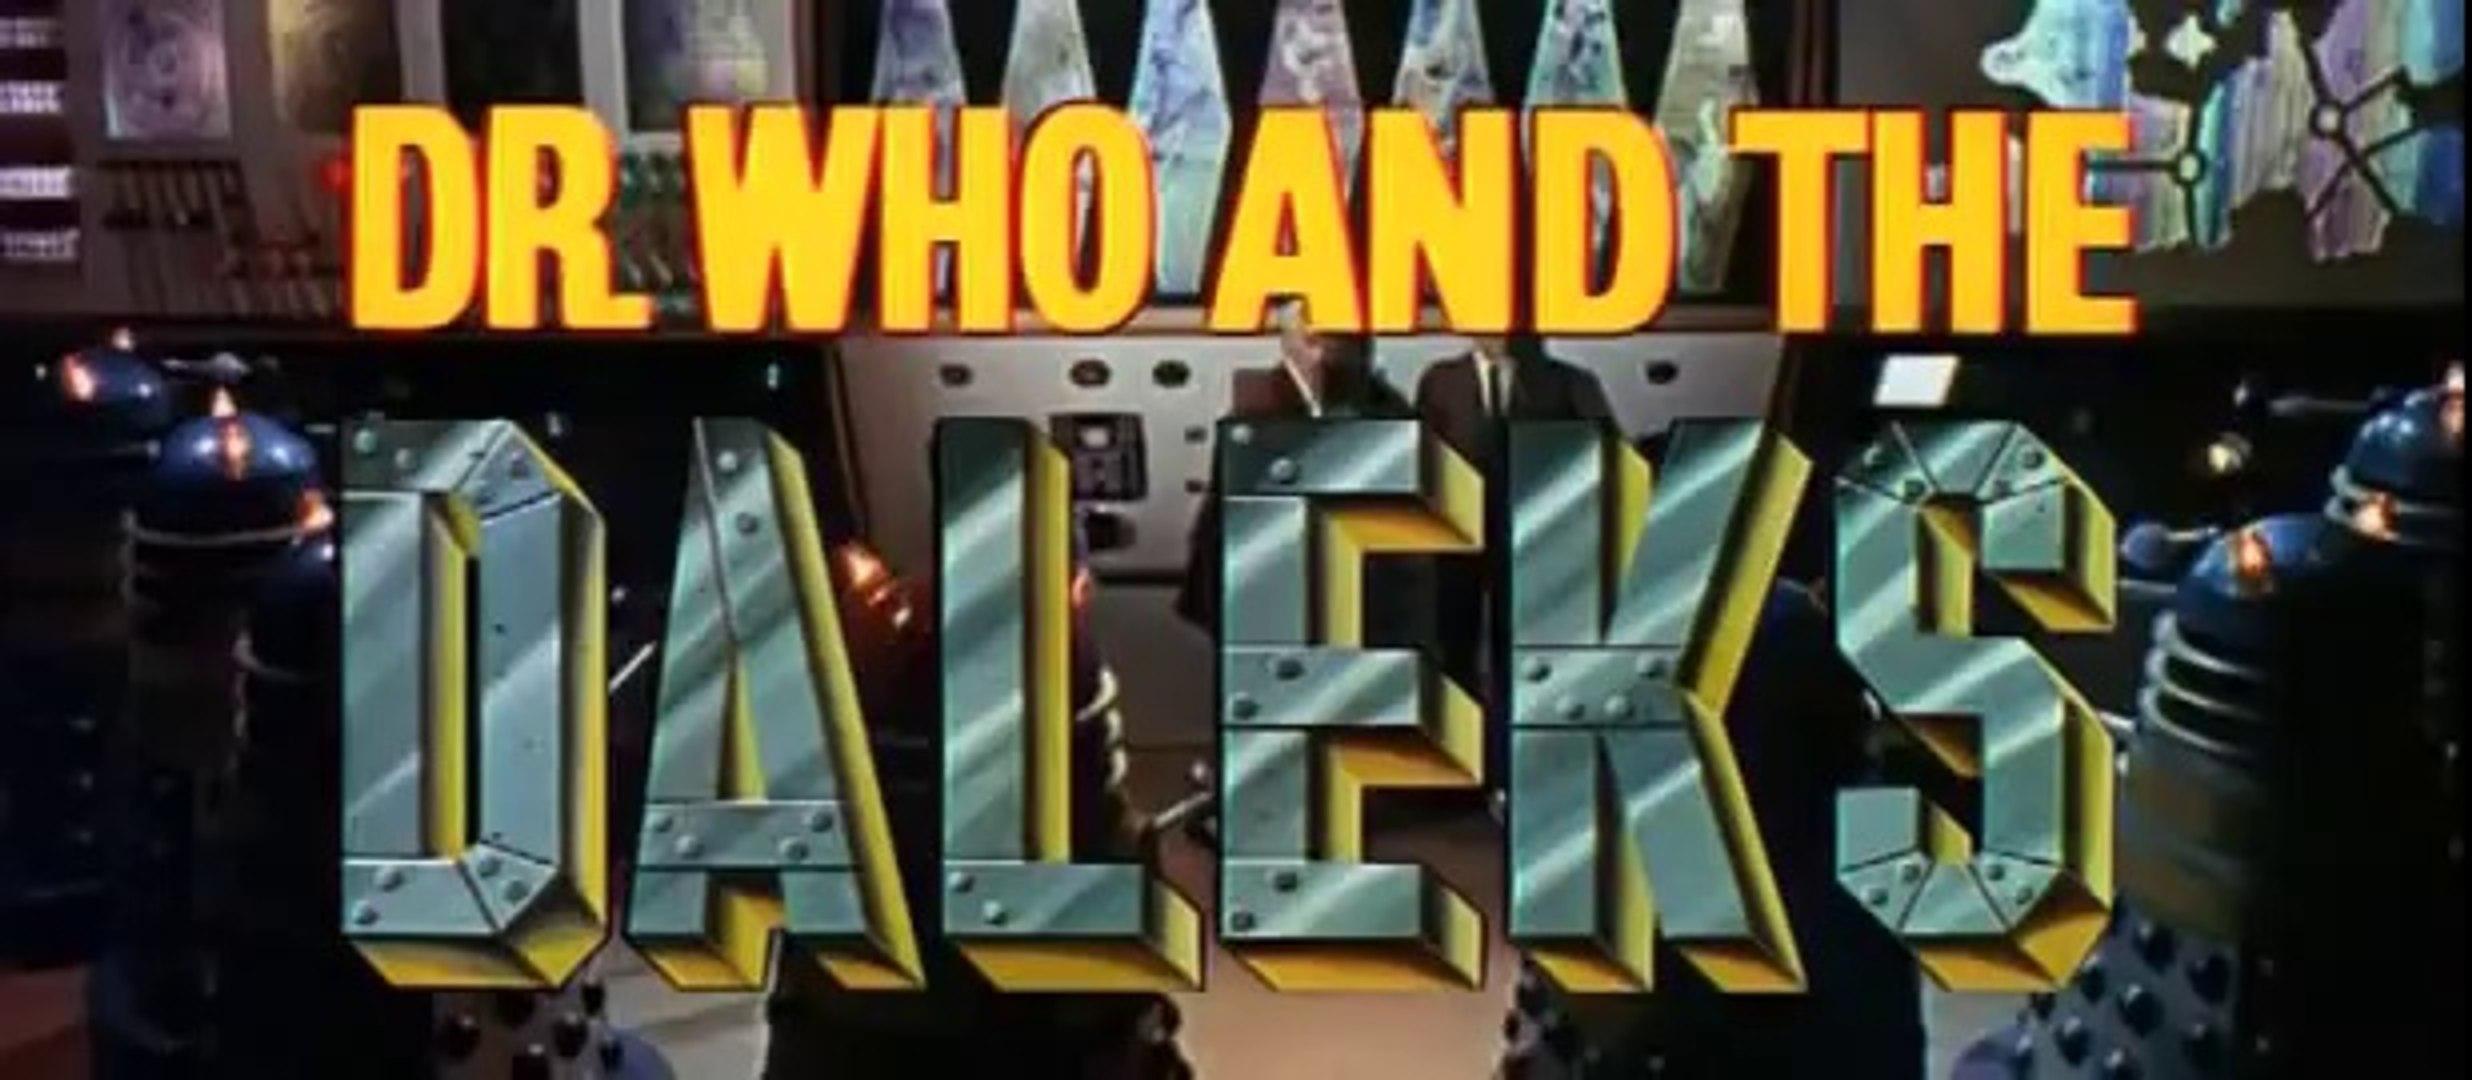 Dr who and the daleks (1965) original trailer